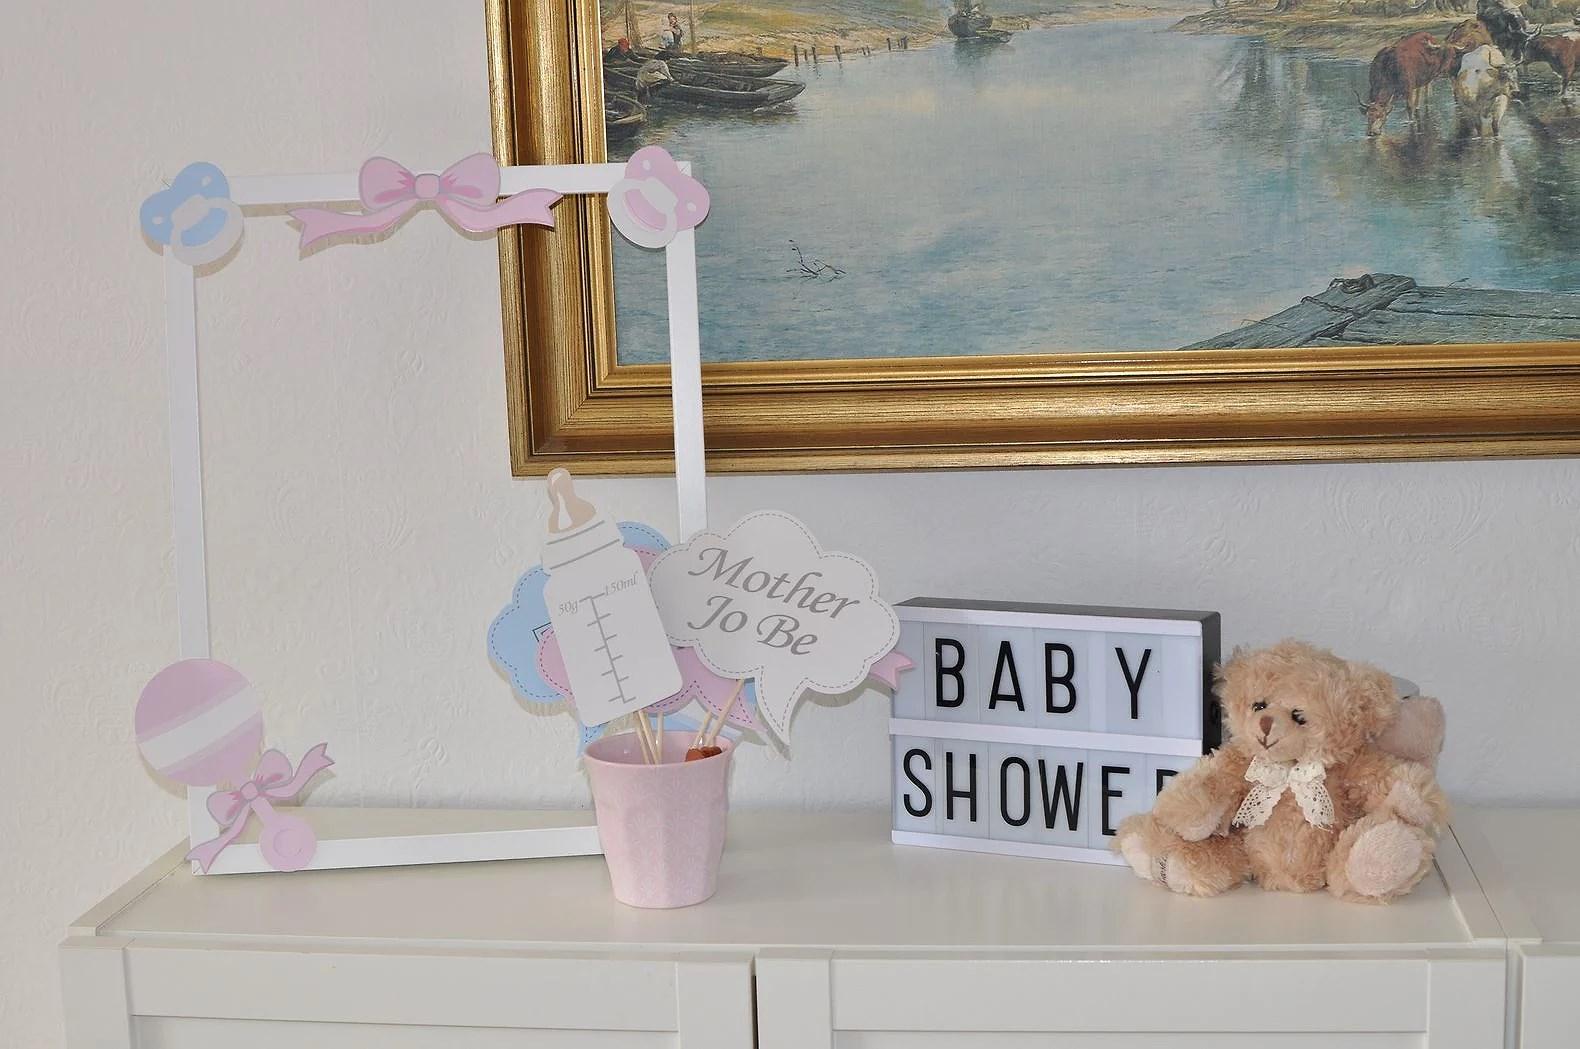 babyshower rekvisita